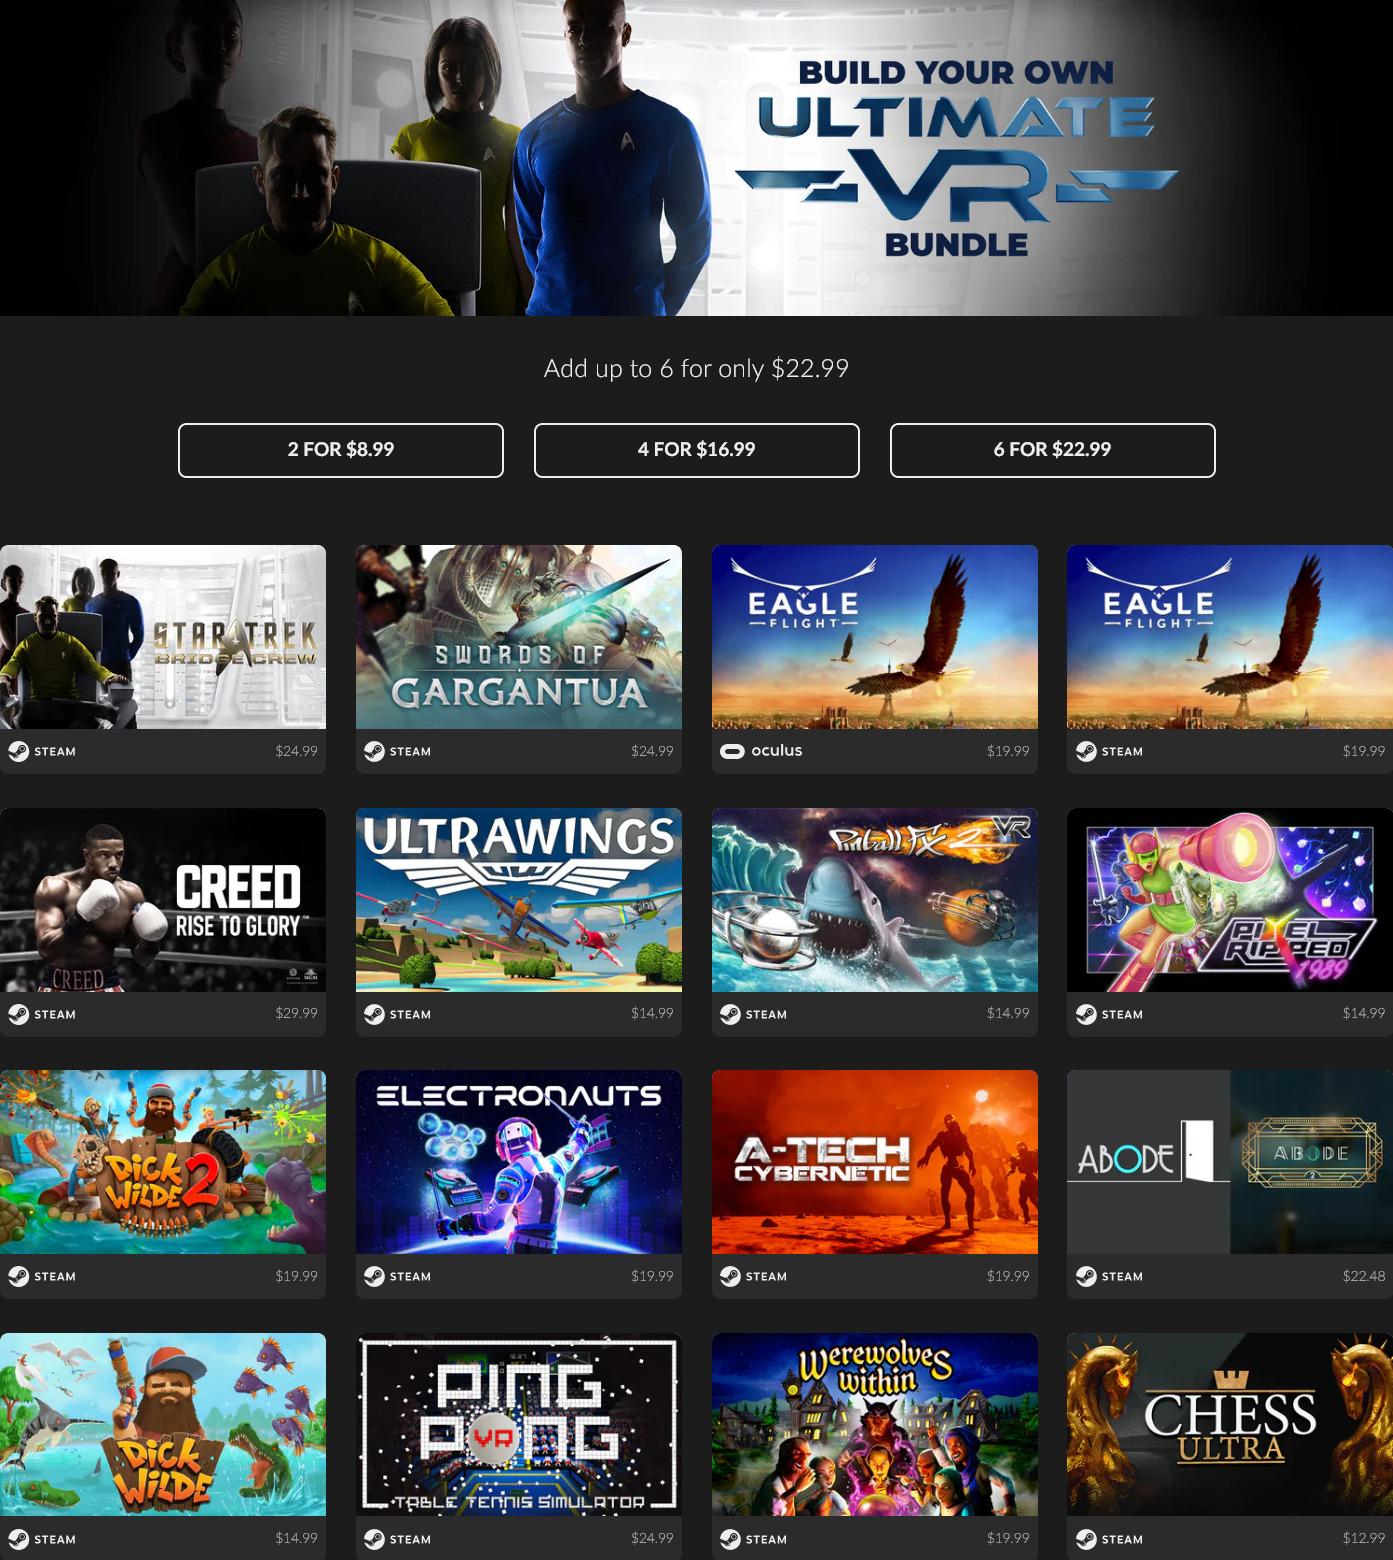 Screenshot_2021-02-21 Fanatical Build your own Ultimate VR Bundle.jpg